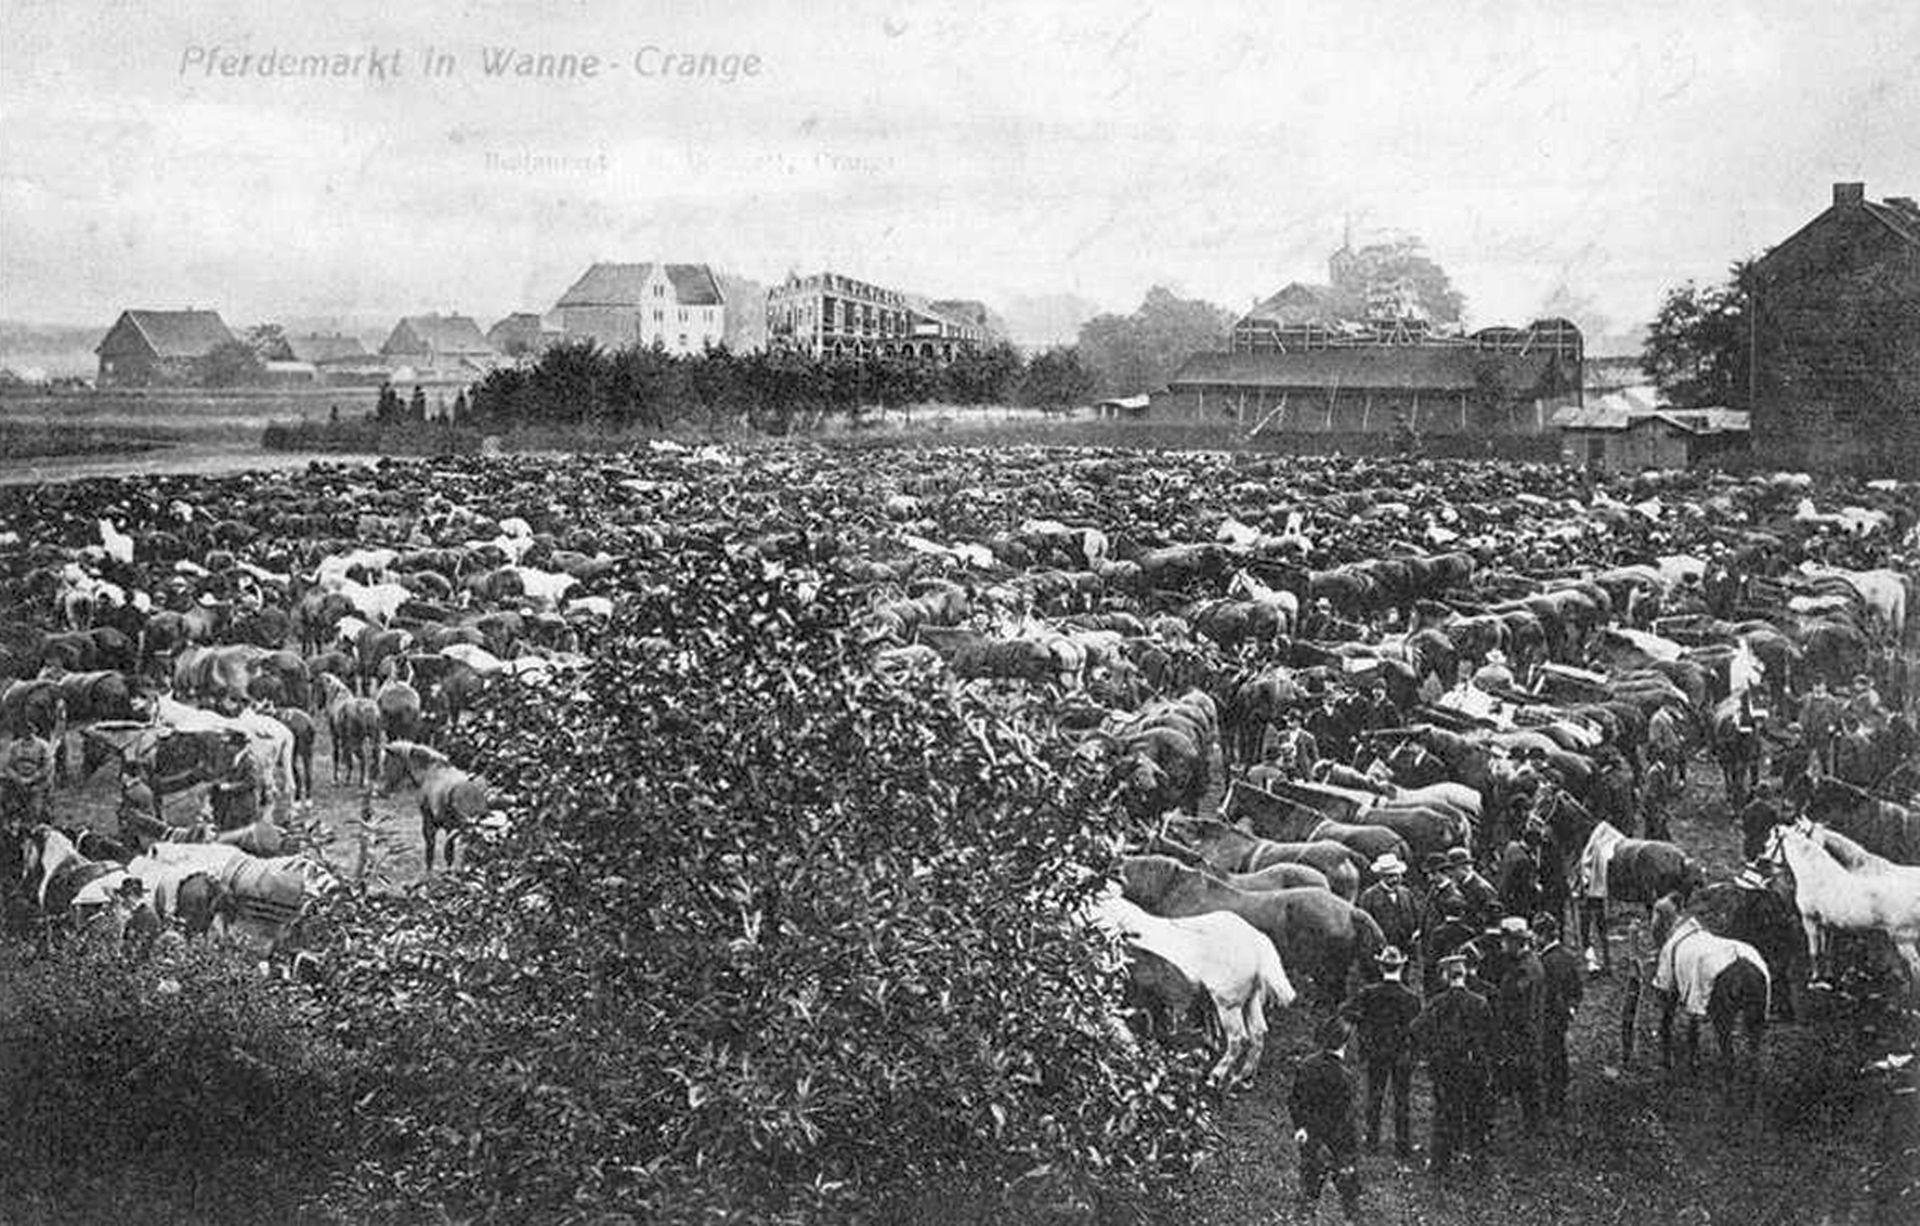 Cranger Pferdemarkt, um 1903.jpg